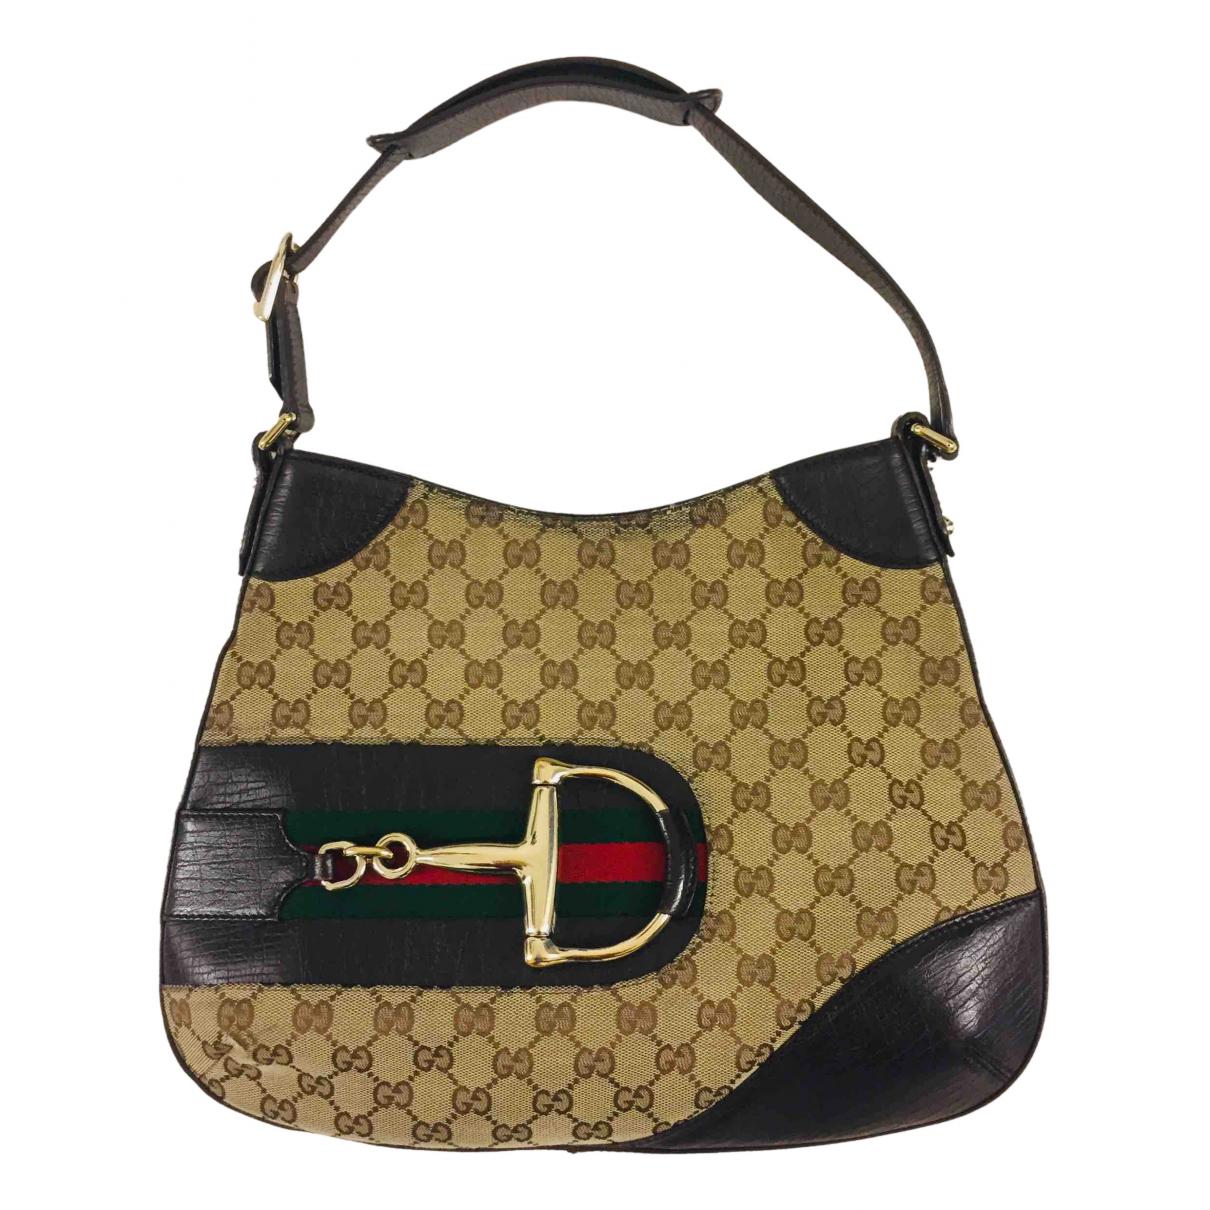 Gucci - Sac a main Hobo pour femme en toile - marron